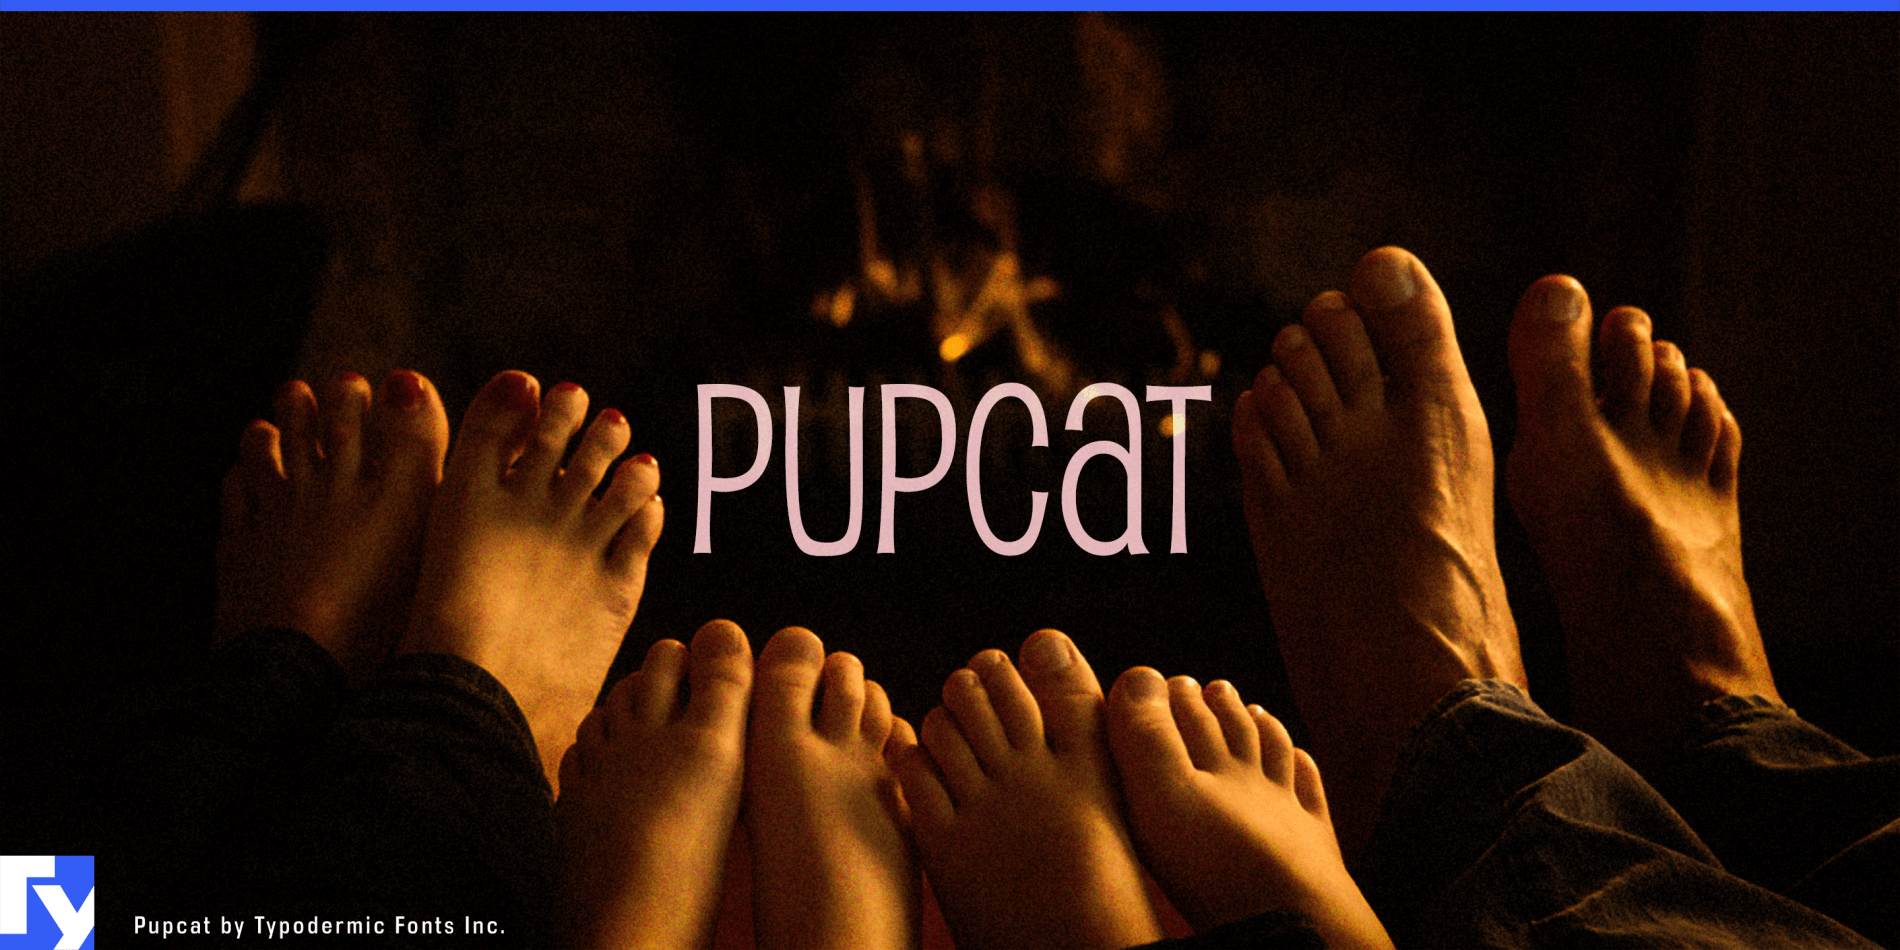 Pupcat